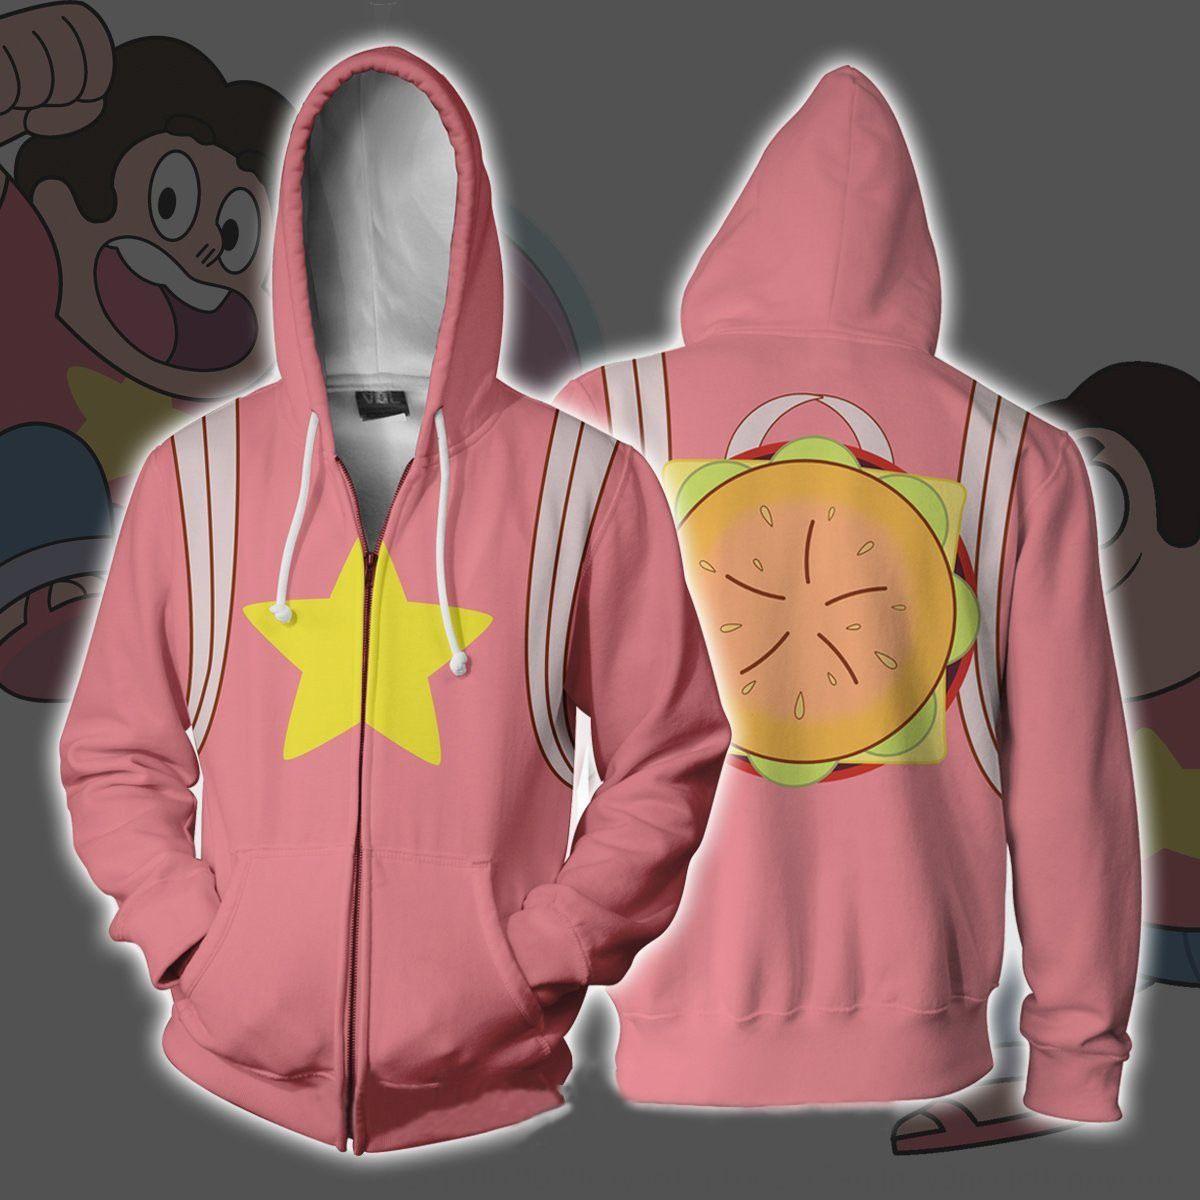 Neue Pullover Sweatshirt Cosmos Junge 2019 3D Pullover Digitaldruck Reißverschluss Kapuzenjacke Cosplay Animation